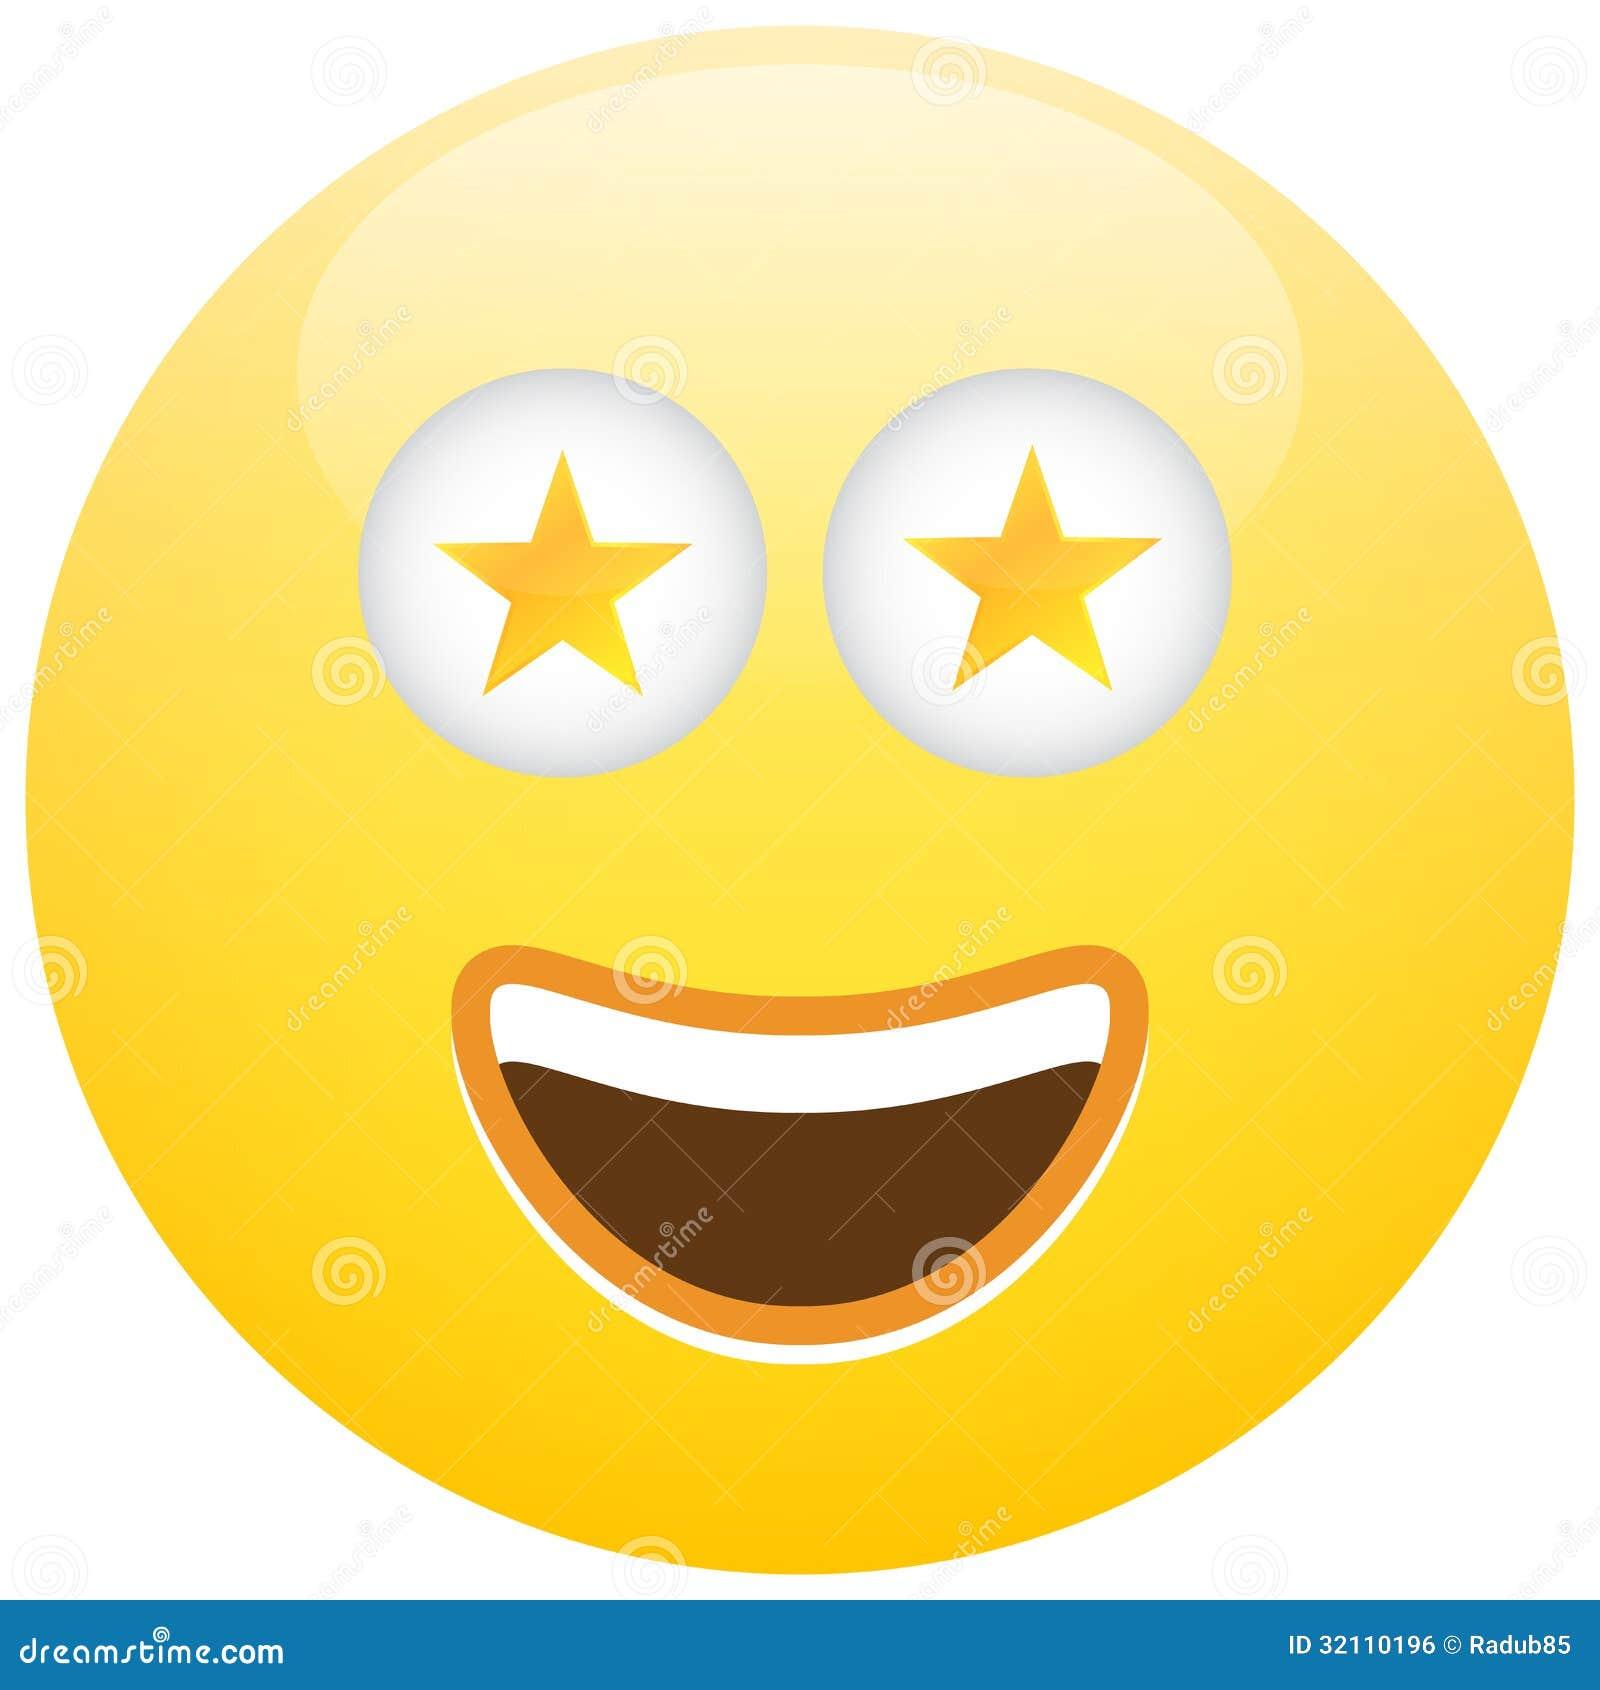 Grinning Face With Star Eyes Emoji - Emojipedia